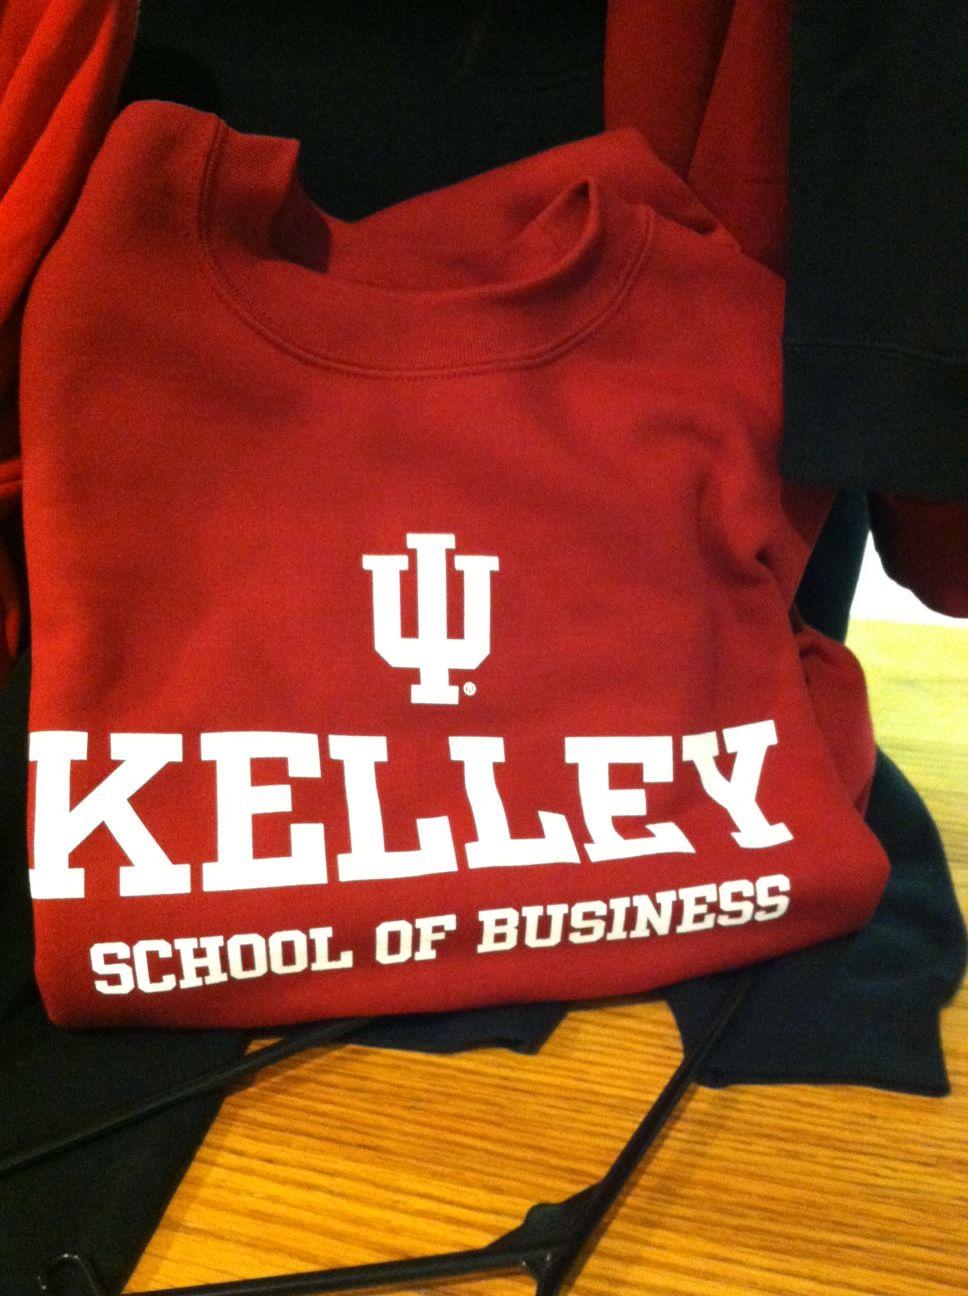 New Kelley Crew Neck Sweatshirts Are In Crew Neck Sweatshirt Sweatshirts Apparel